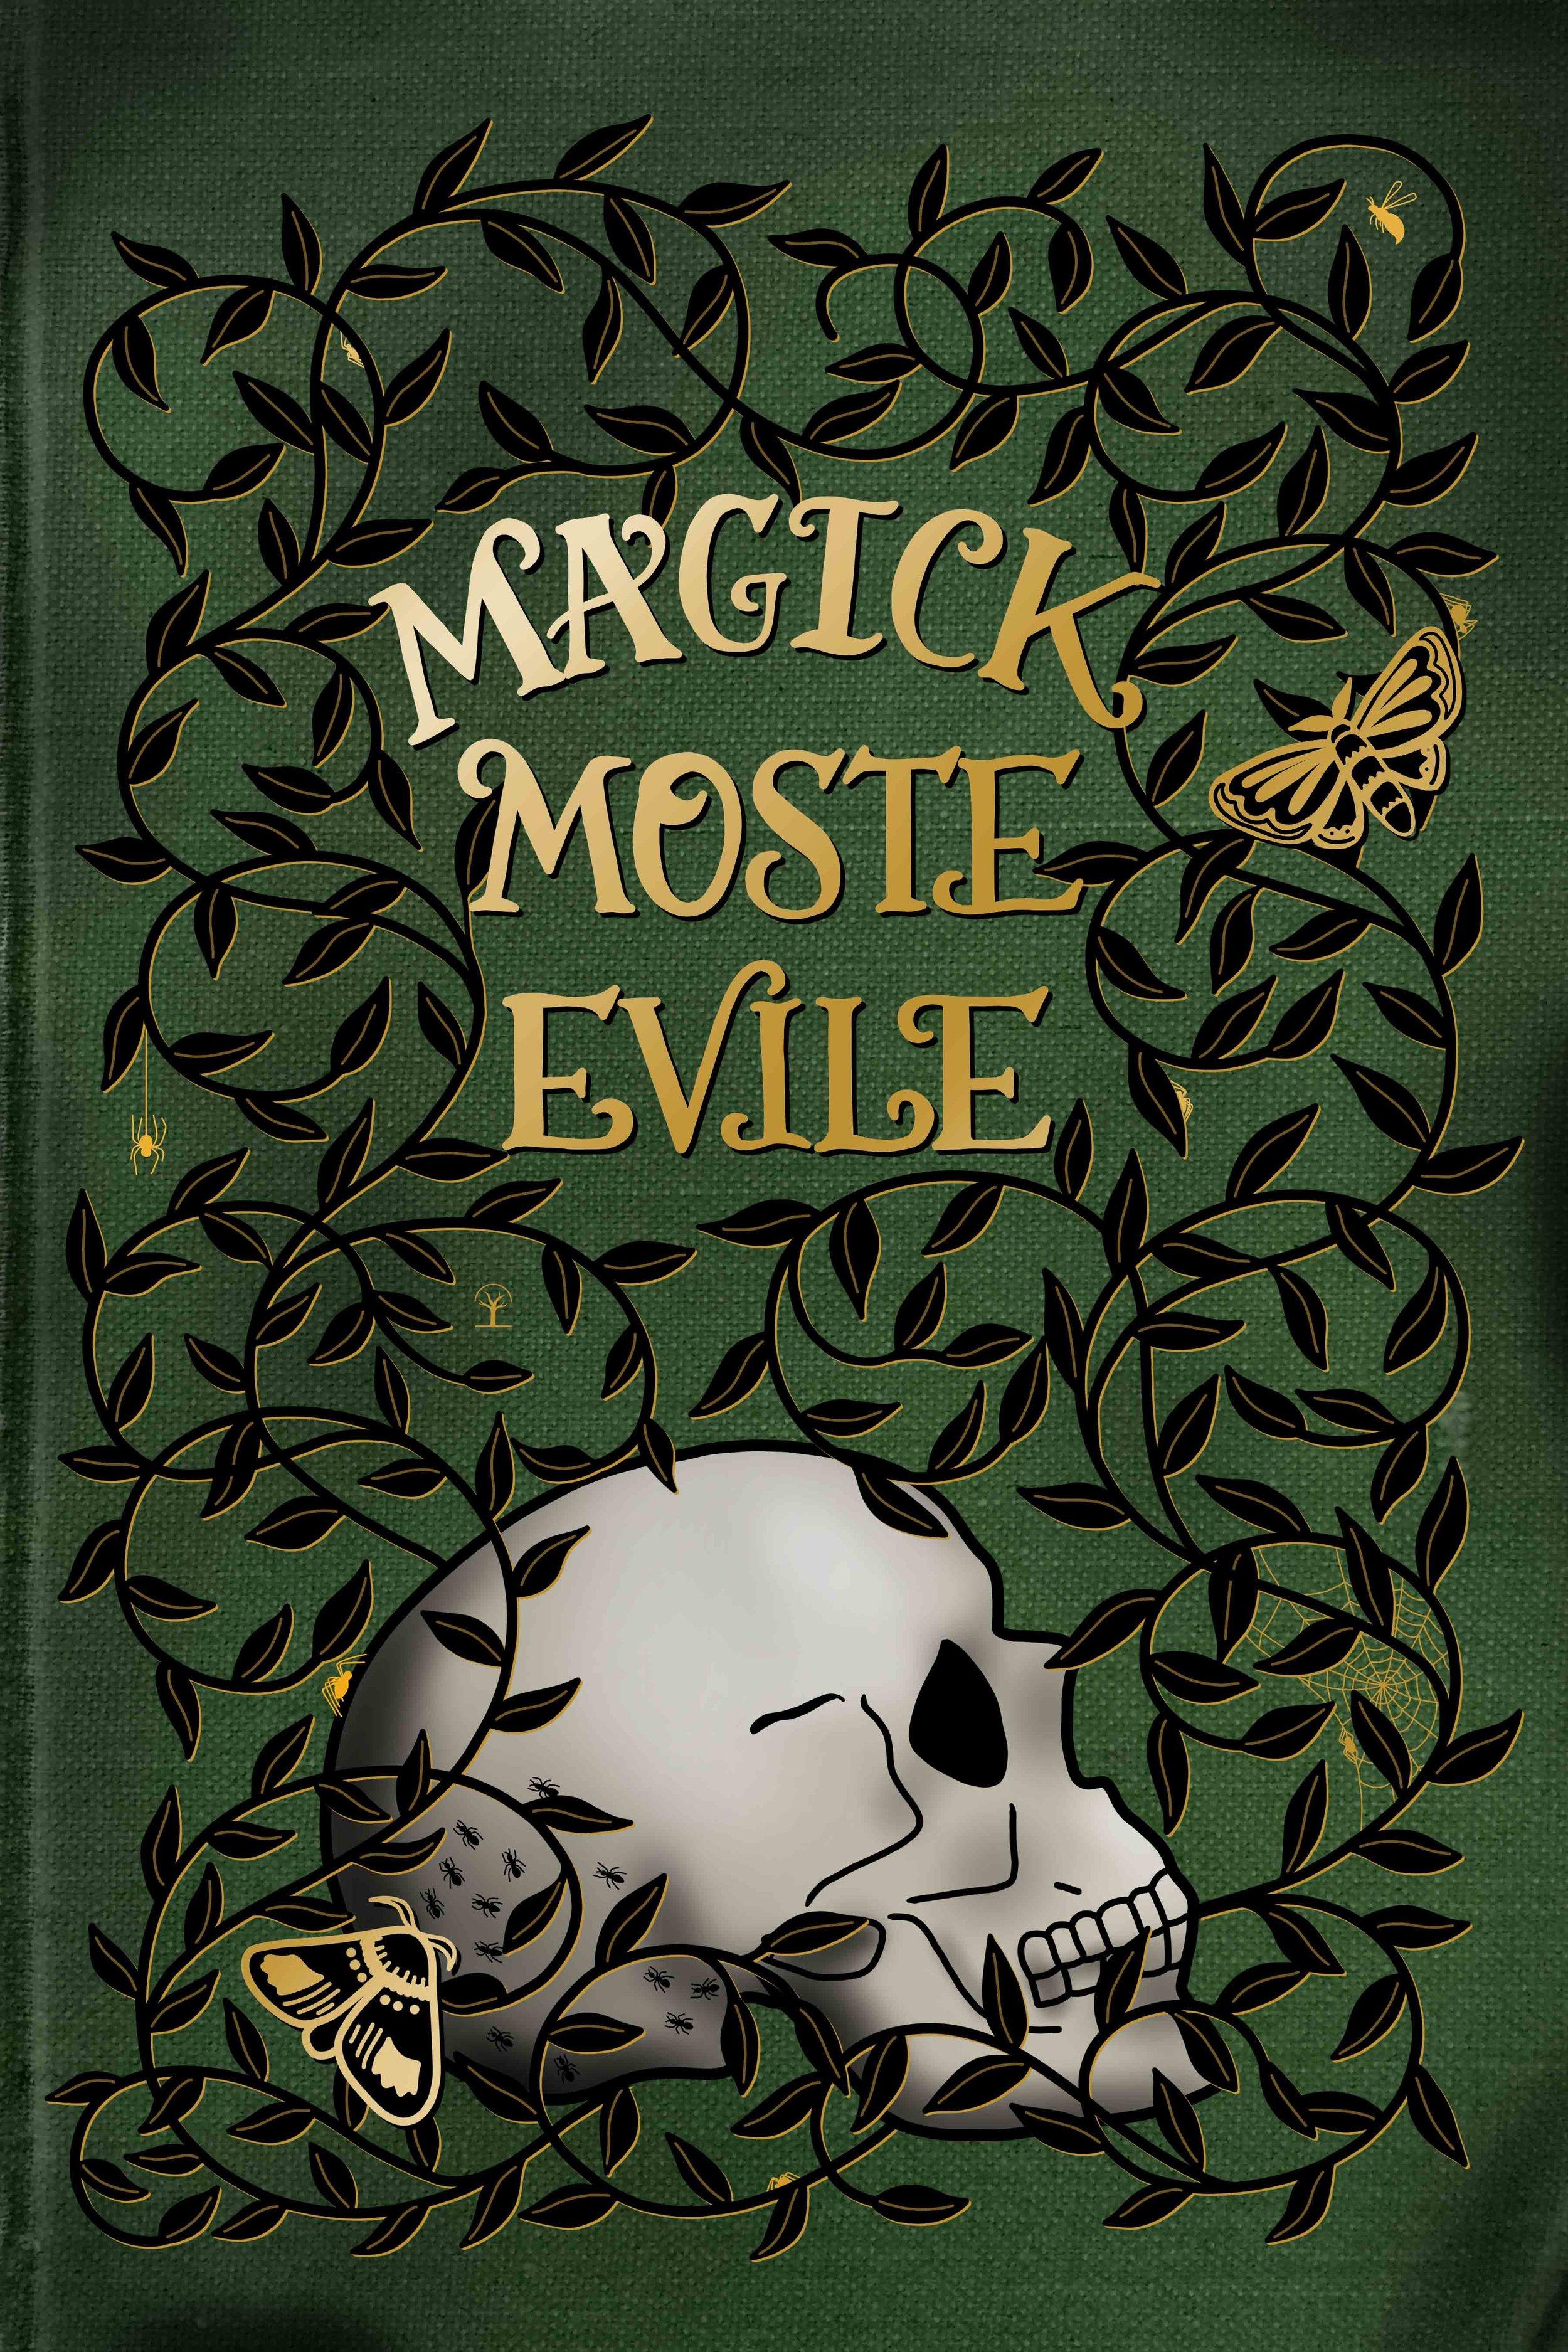 Magick_Moste_Evile_.jpg